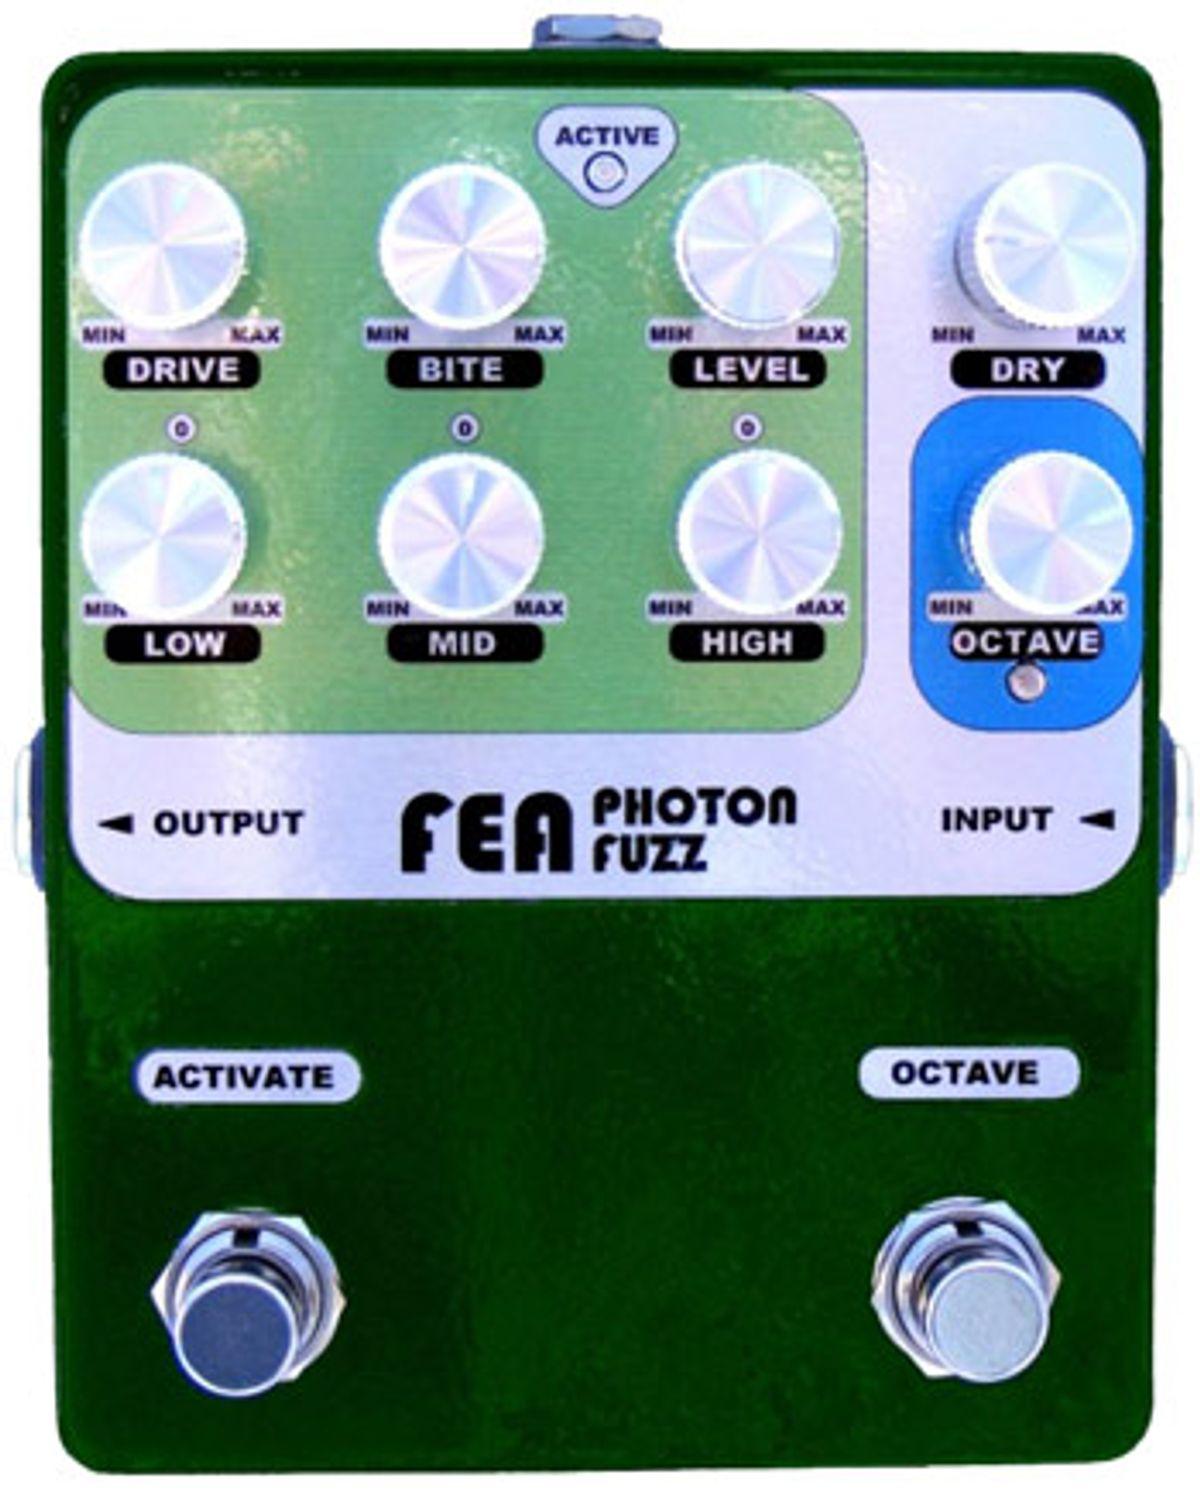 FEA Labs Introduces the Photon Fuzz